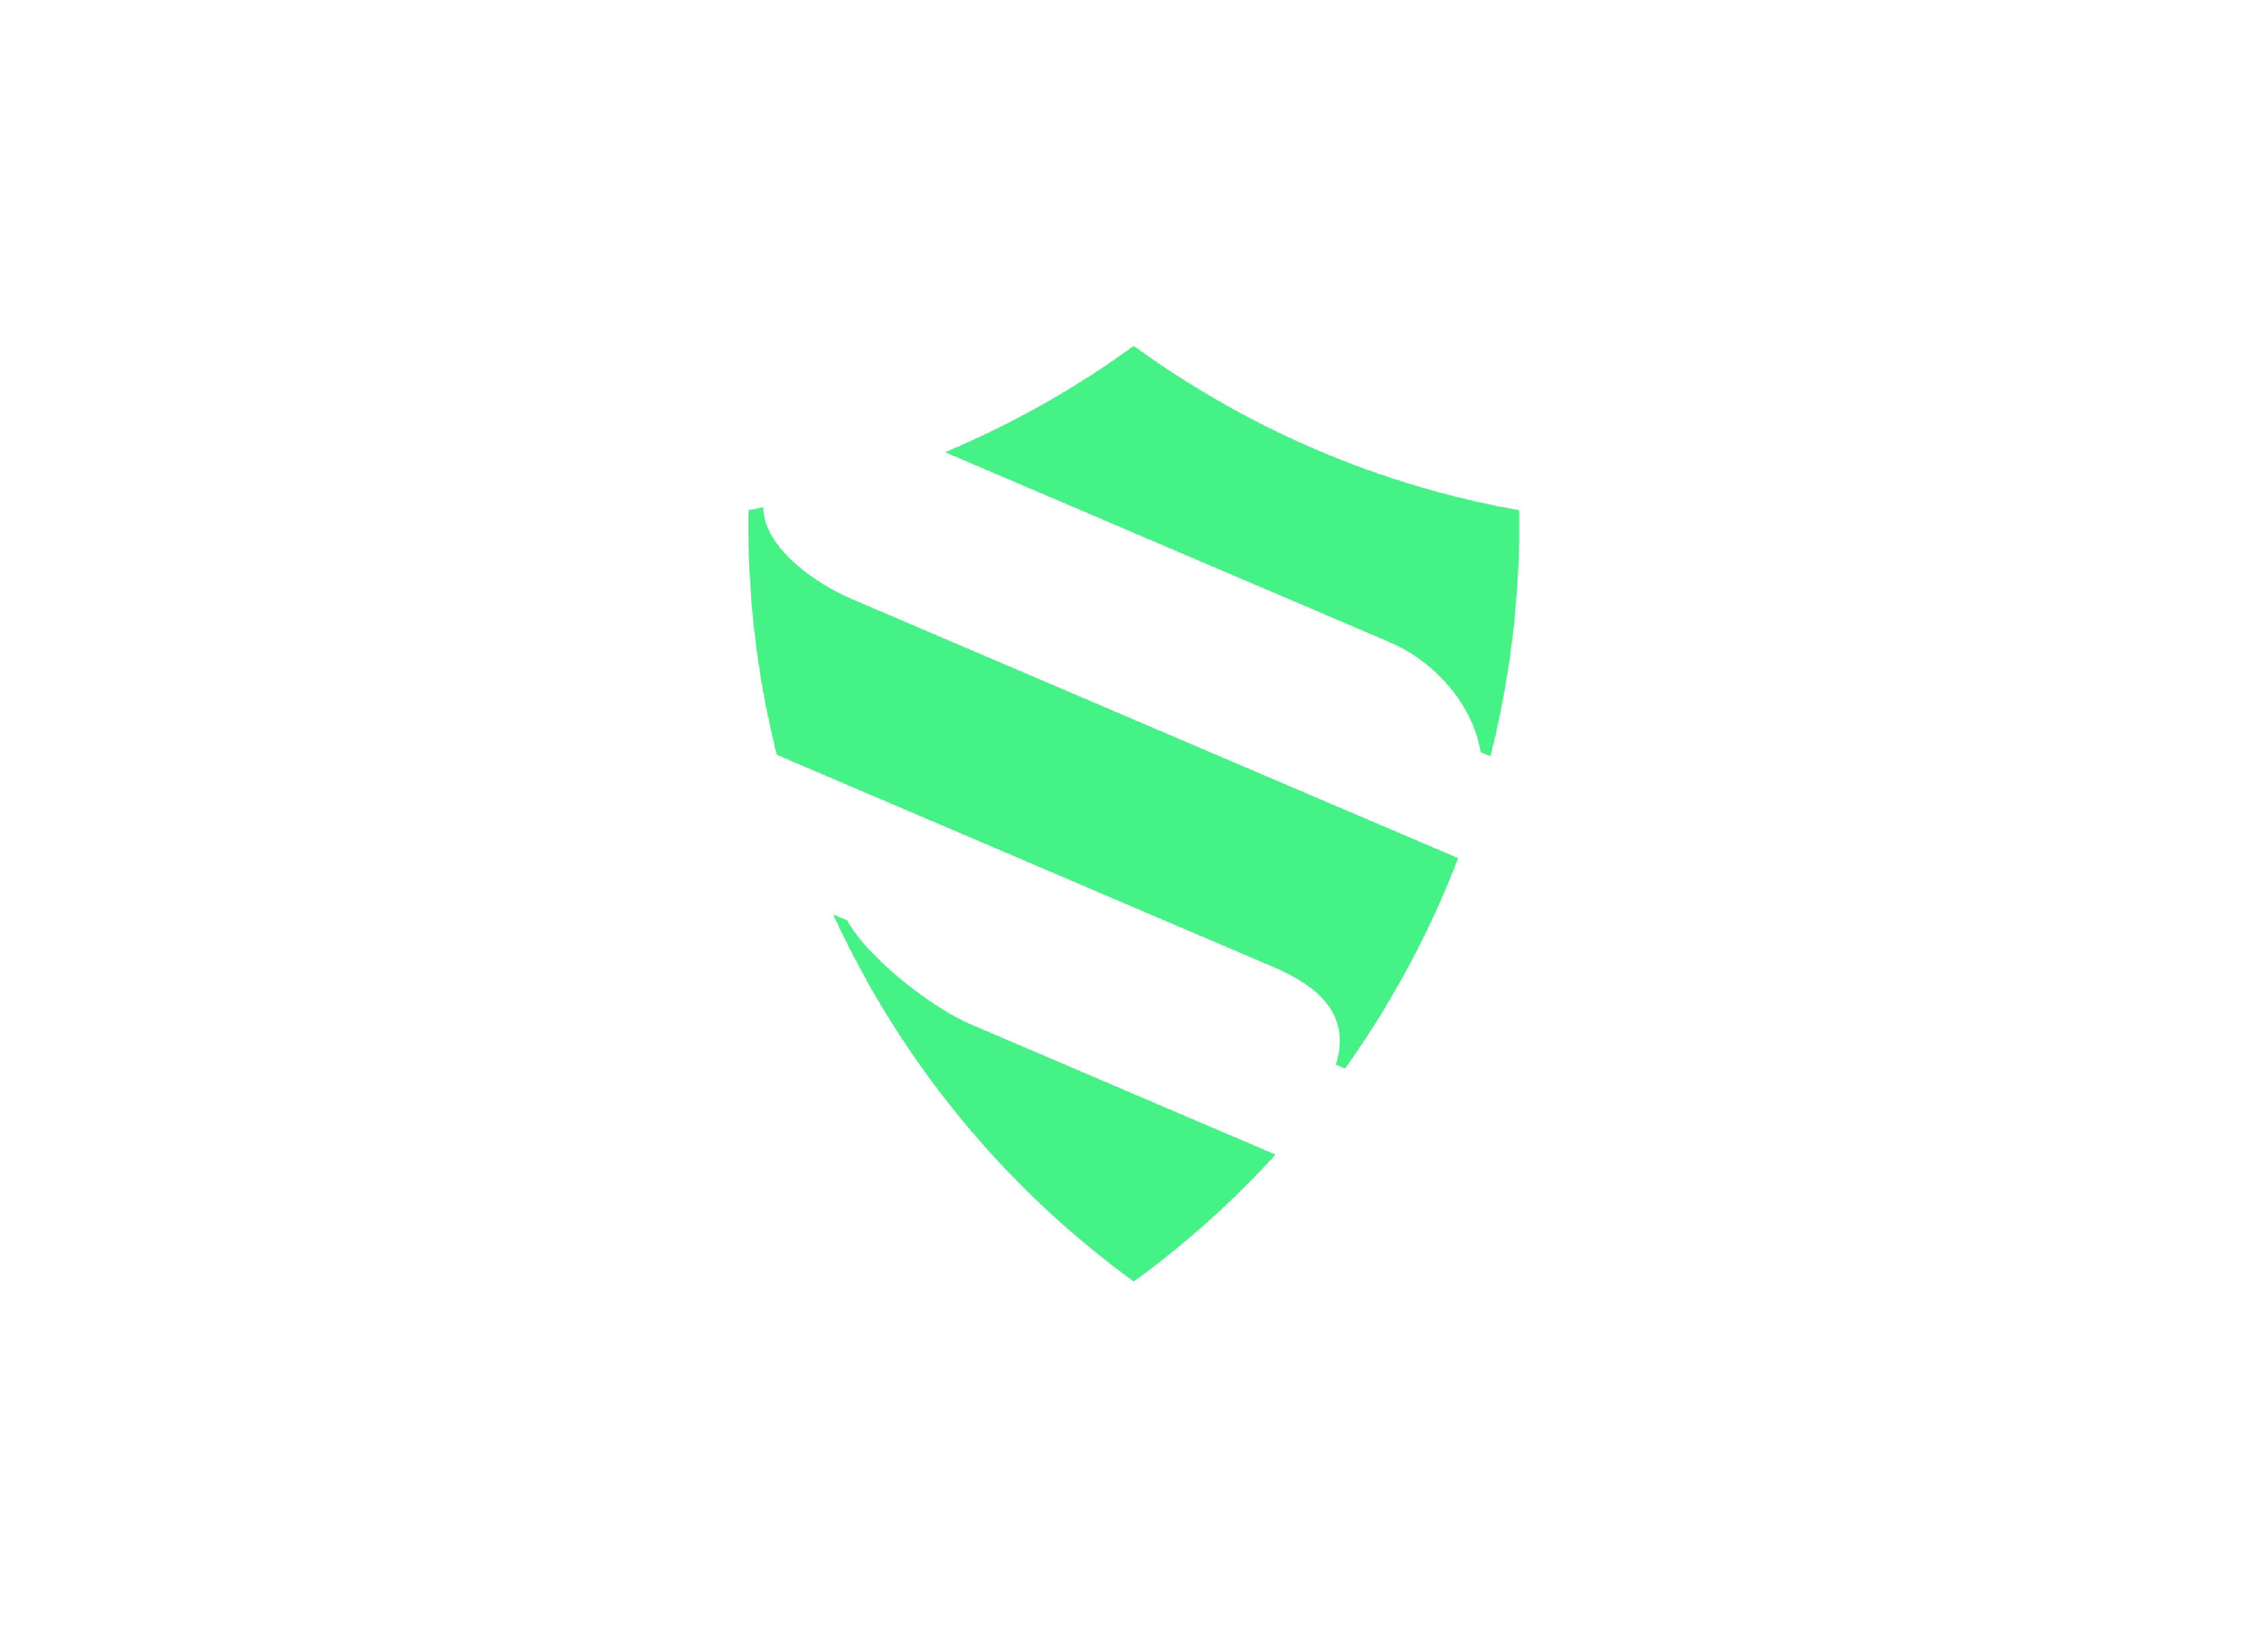 Djalma Santos Icon Shield symbol derived from the Palmeiras team